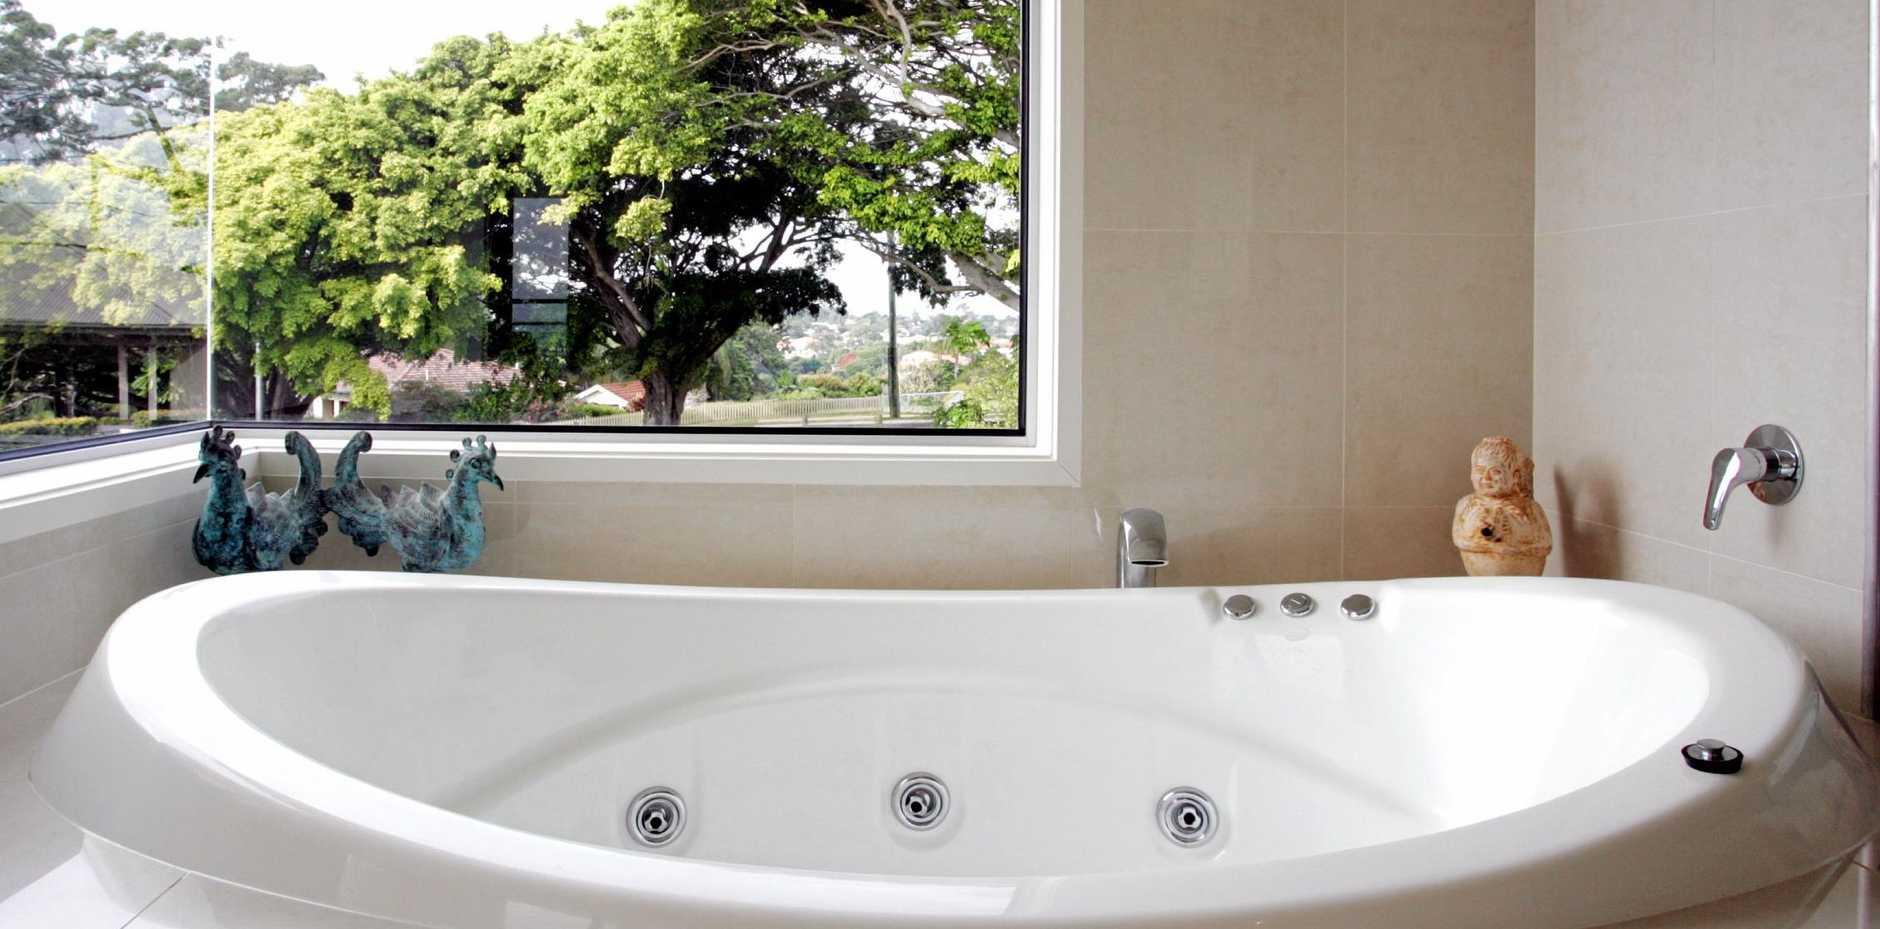 SAFELY RETURNED: A spa bath inside a house, its rightful home (file photo).